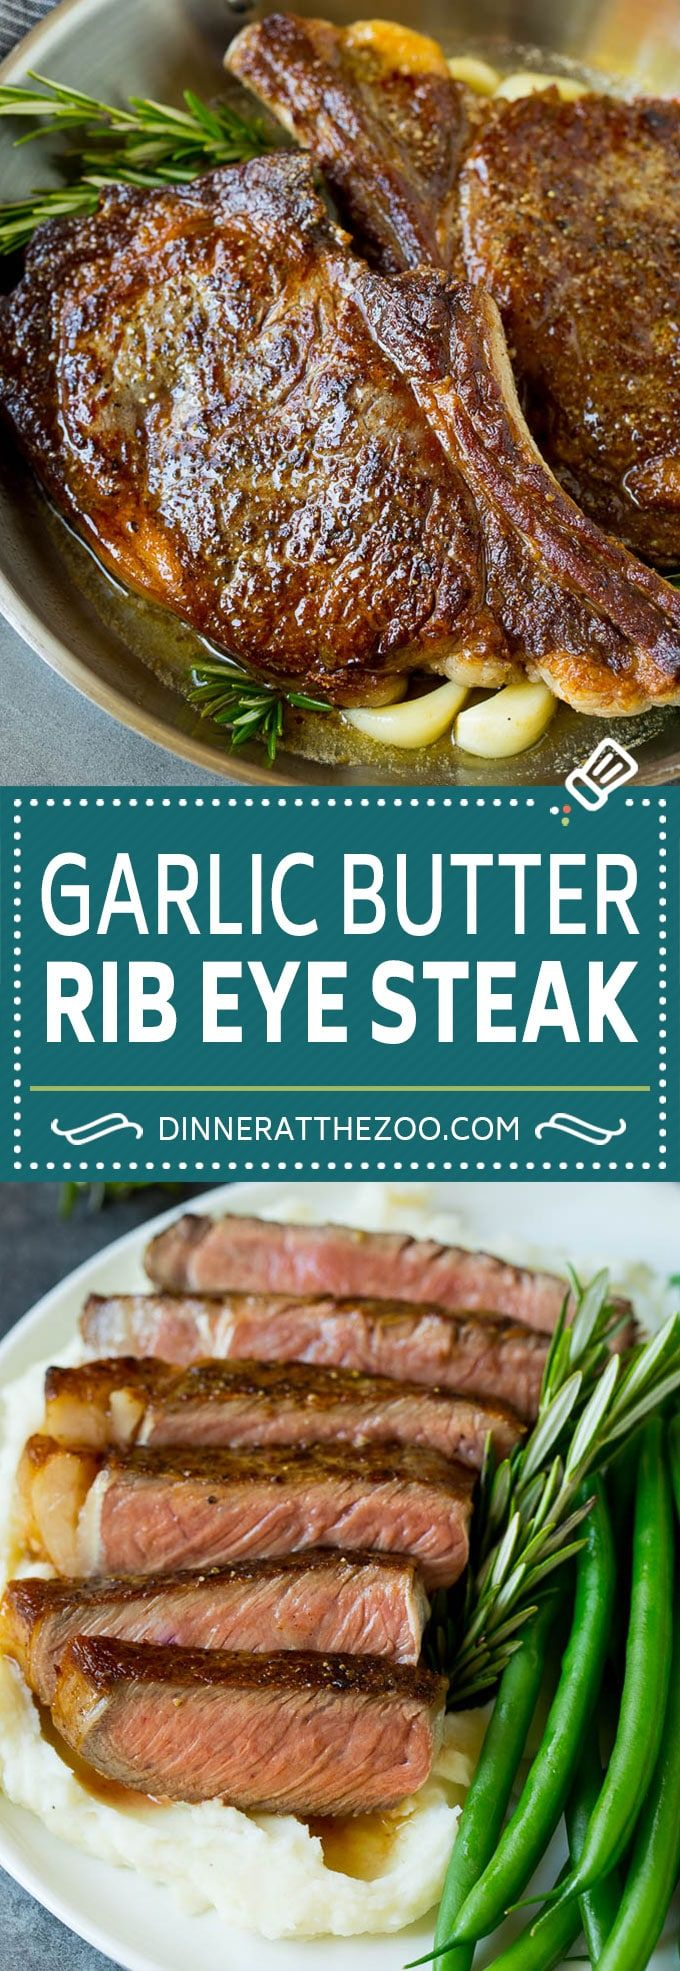 Rib Eye Steak in 2020 | Easy cooking recipes. Recipes. Beef dinner